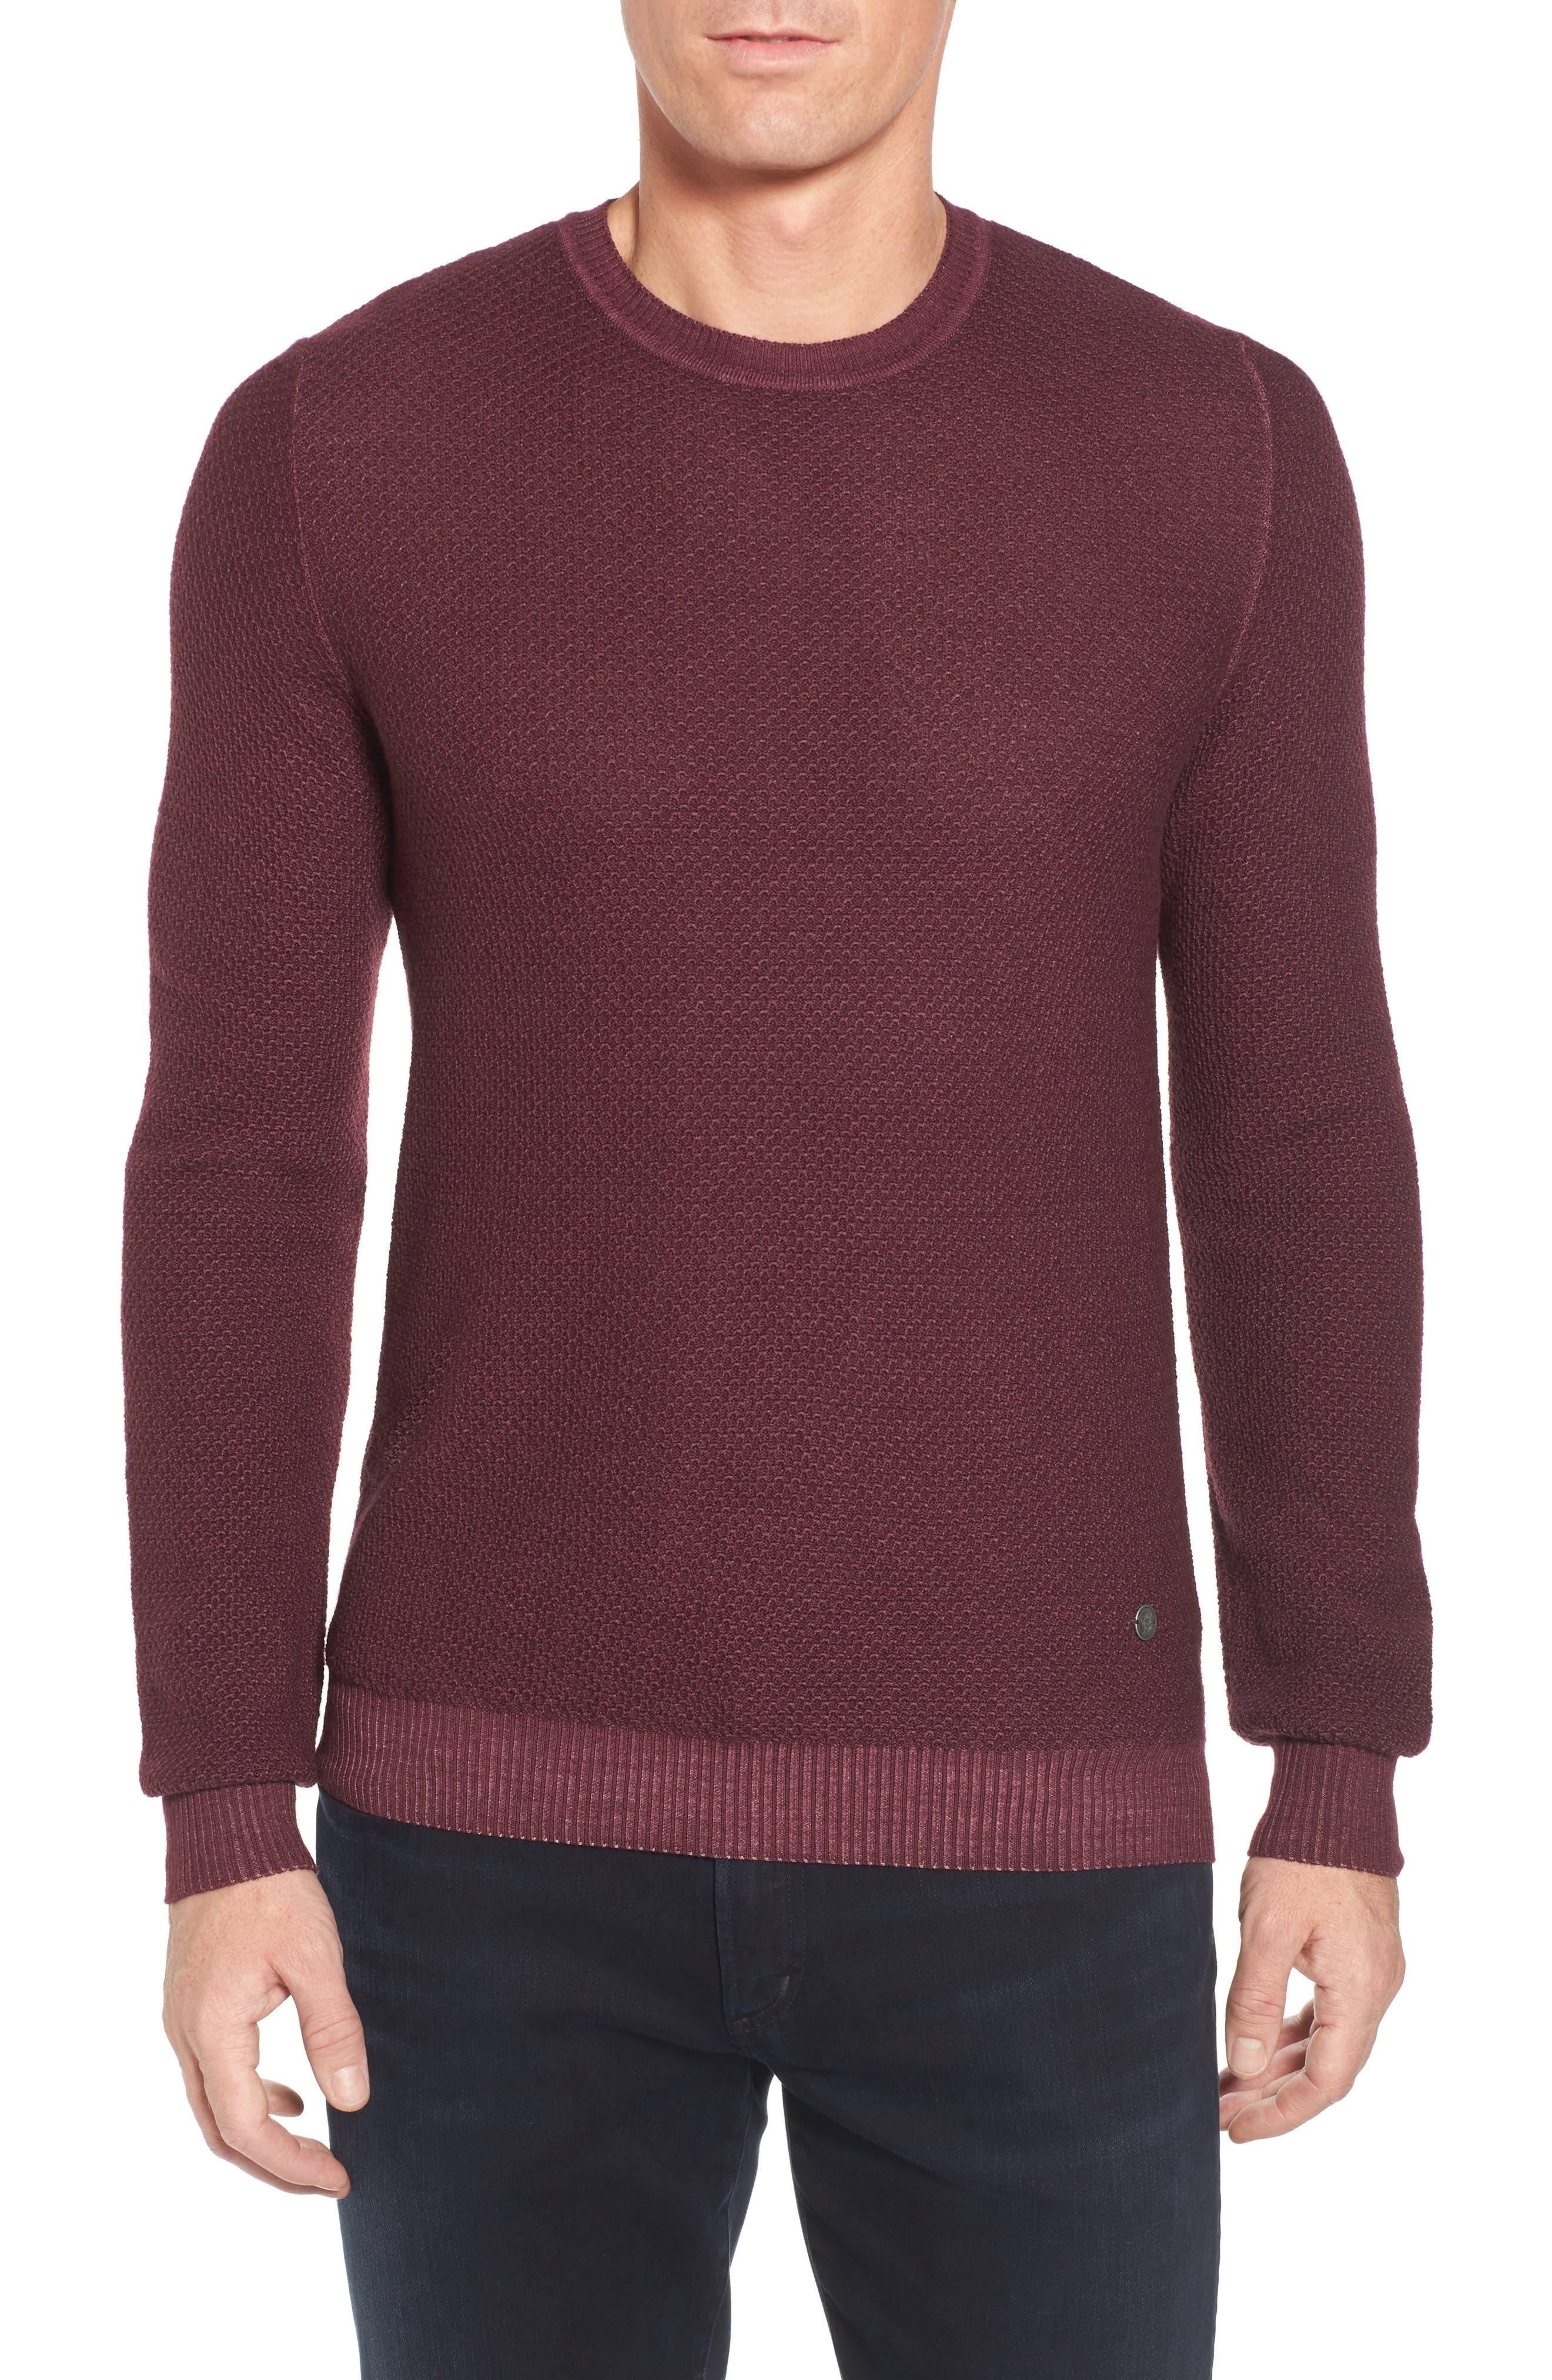 Honeycomb Merino Crewneck Sweater,                             Main thumbnail 1, color,                             Burgundy